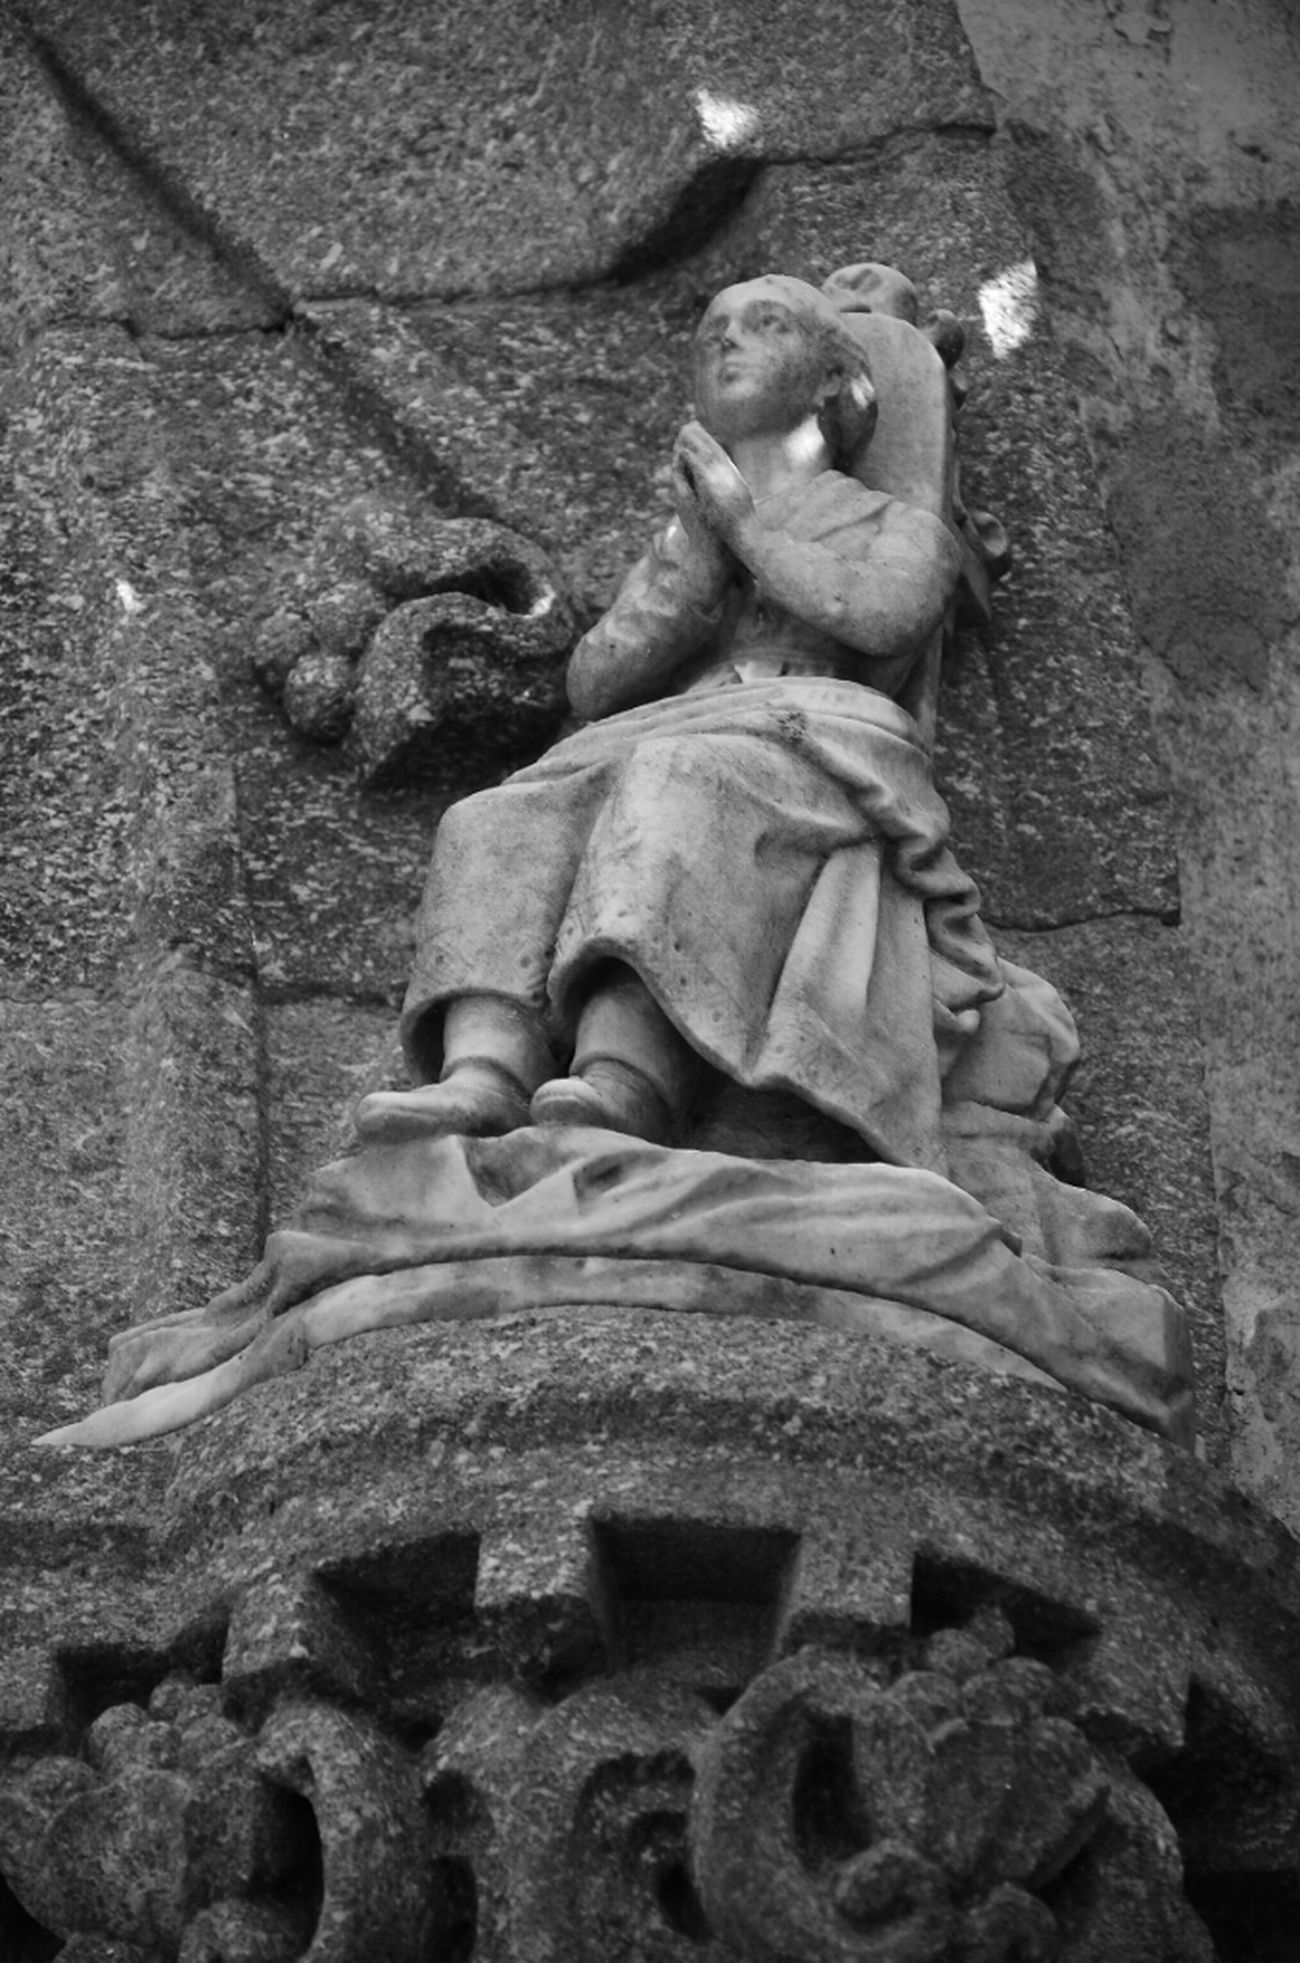 Blackandwhite Black And White Taking Photos Photo Statue Photography